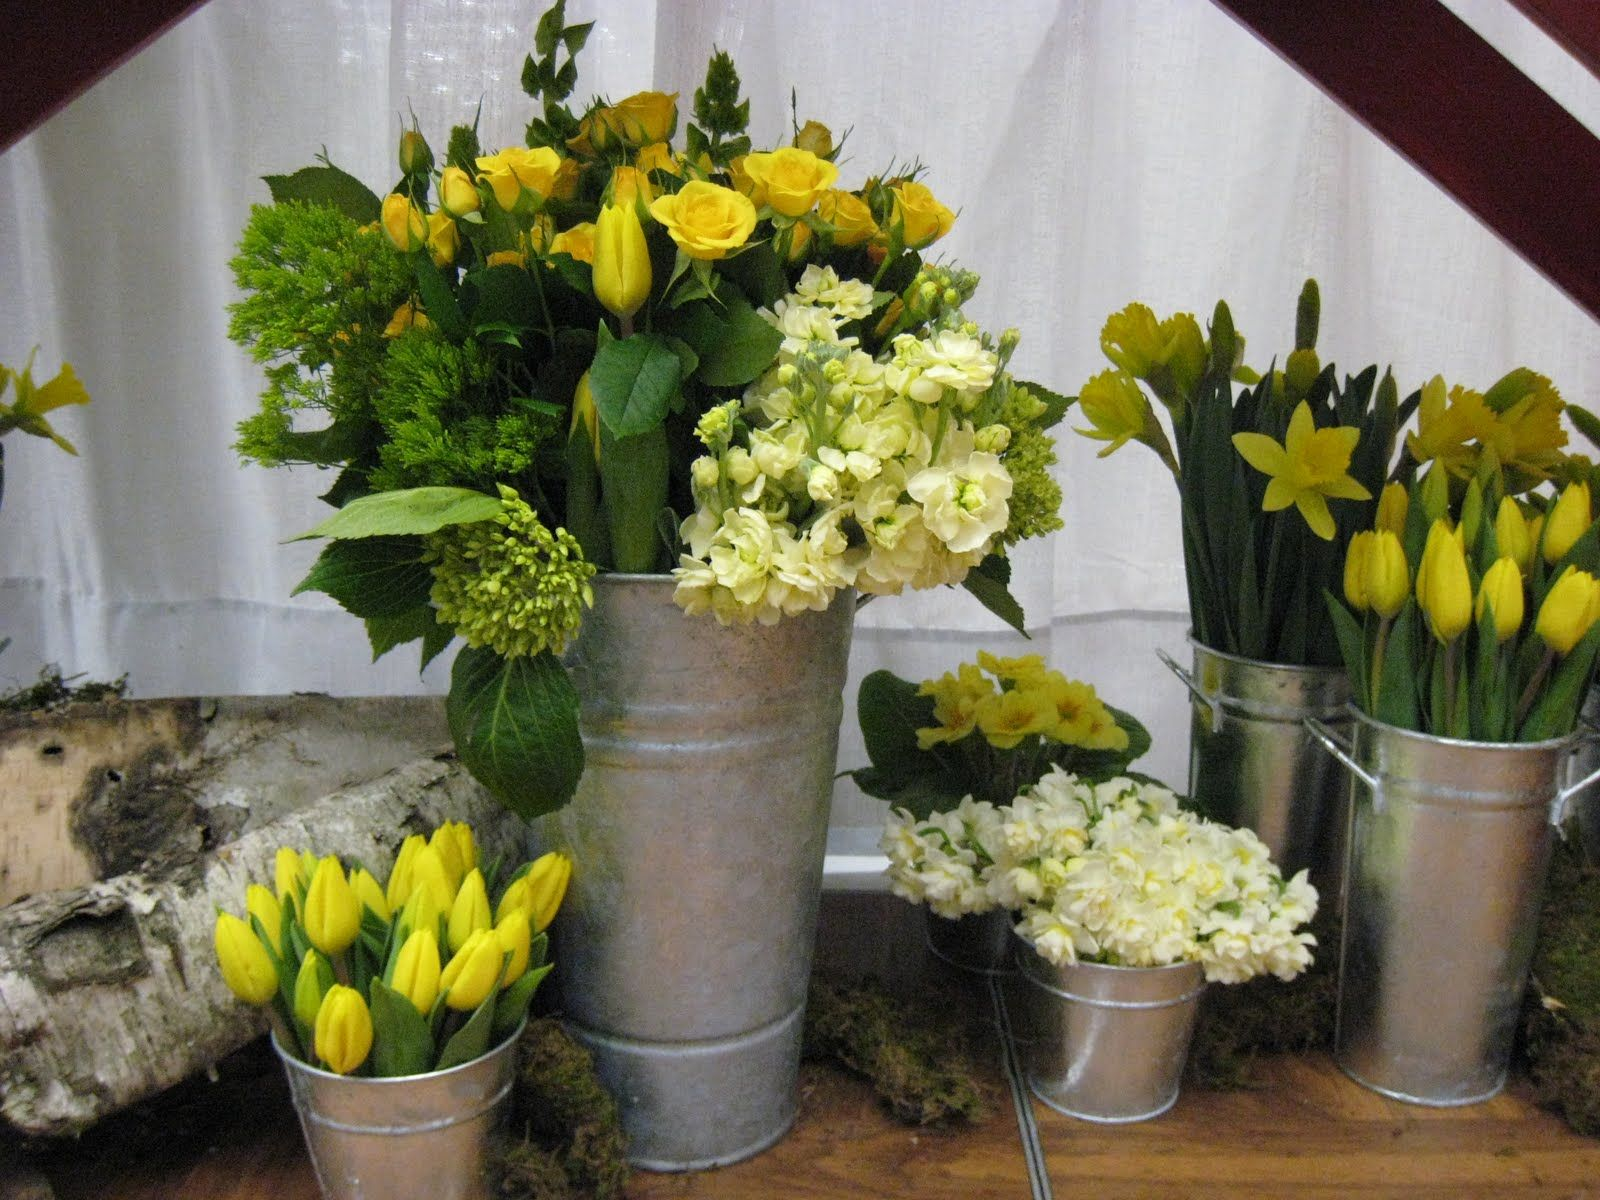 French flower bucket aisle ideas Bridal Flowers Seattle Wedding